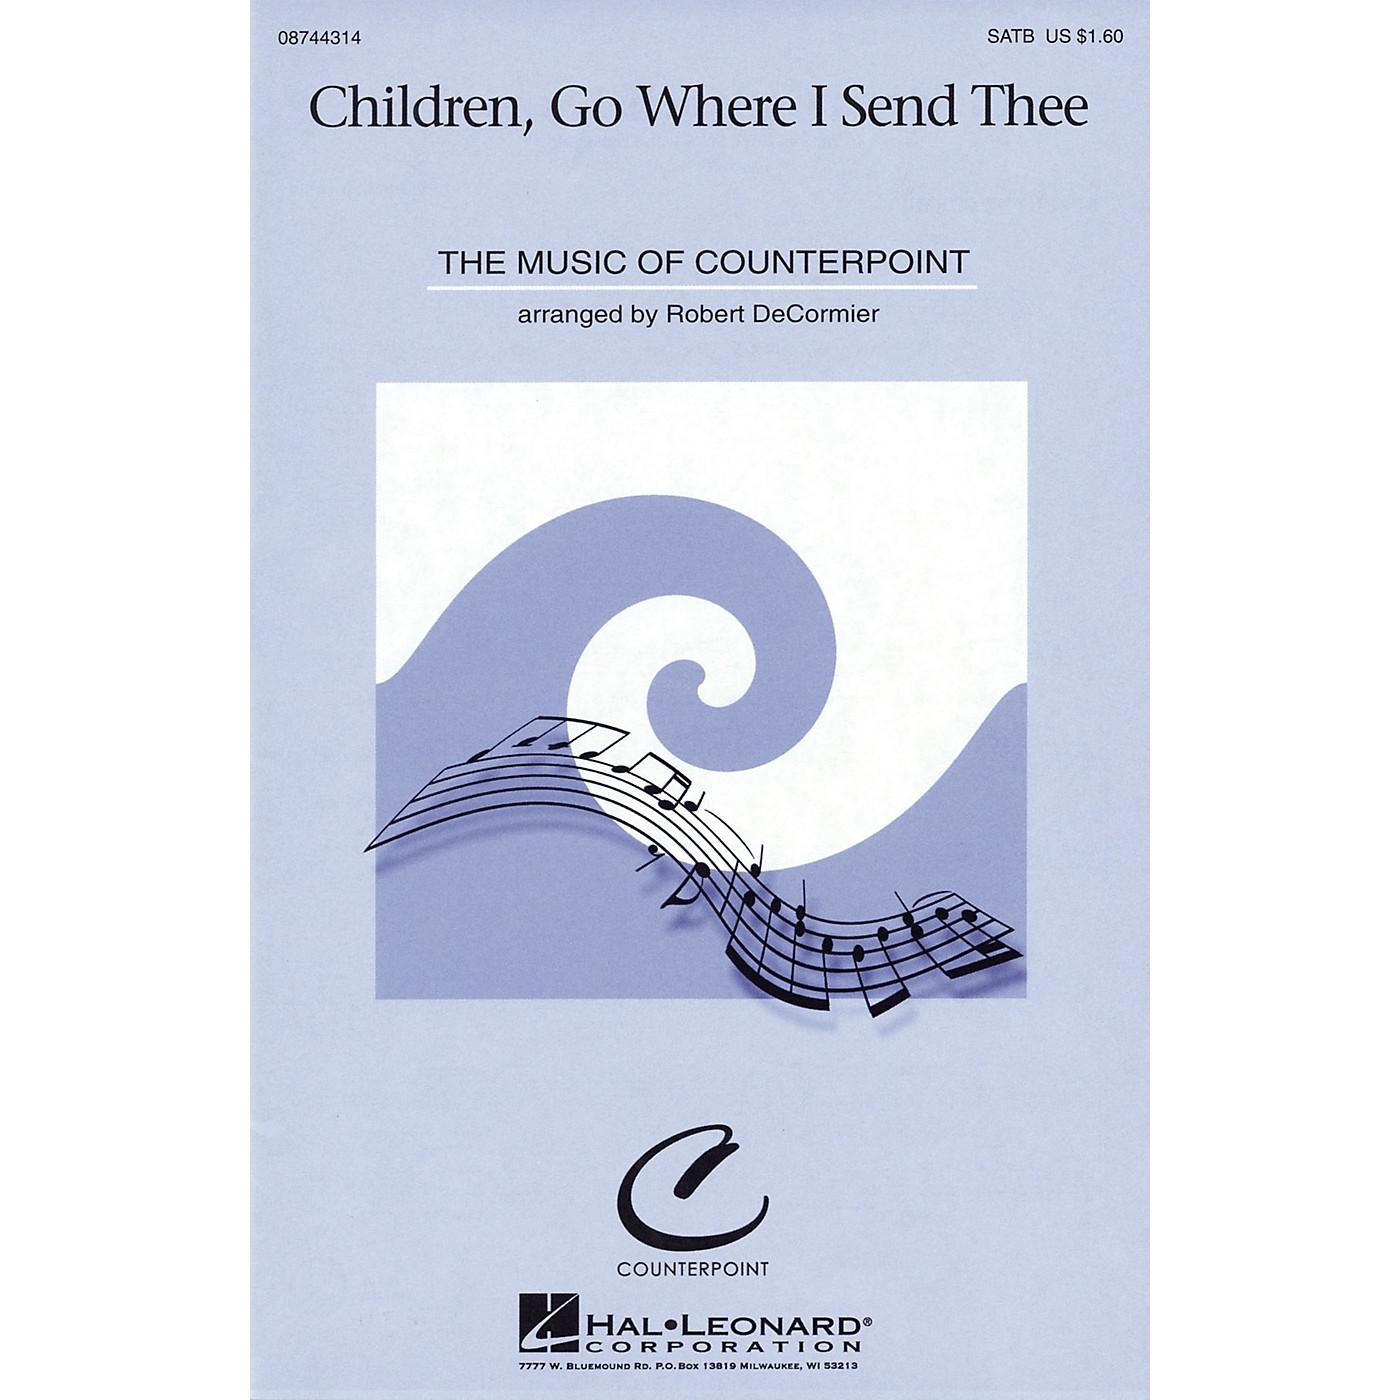 Hal Leonard Children, Go Where I Send Thee SATB arranged by Robert DeCormier thumbnail